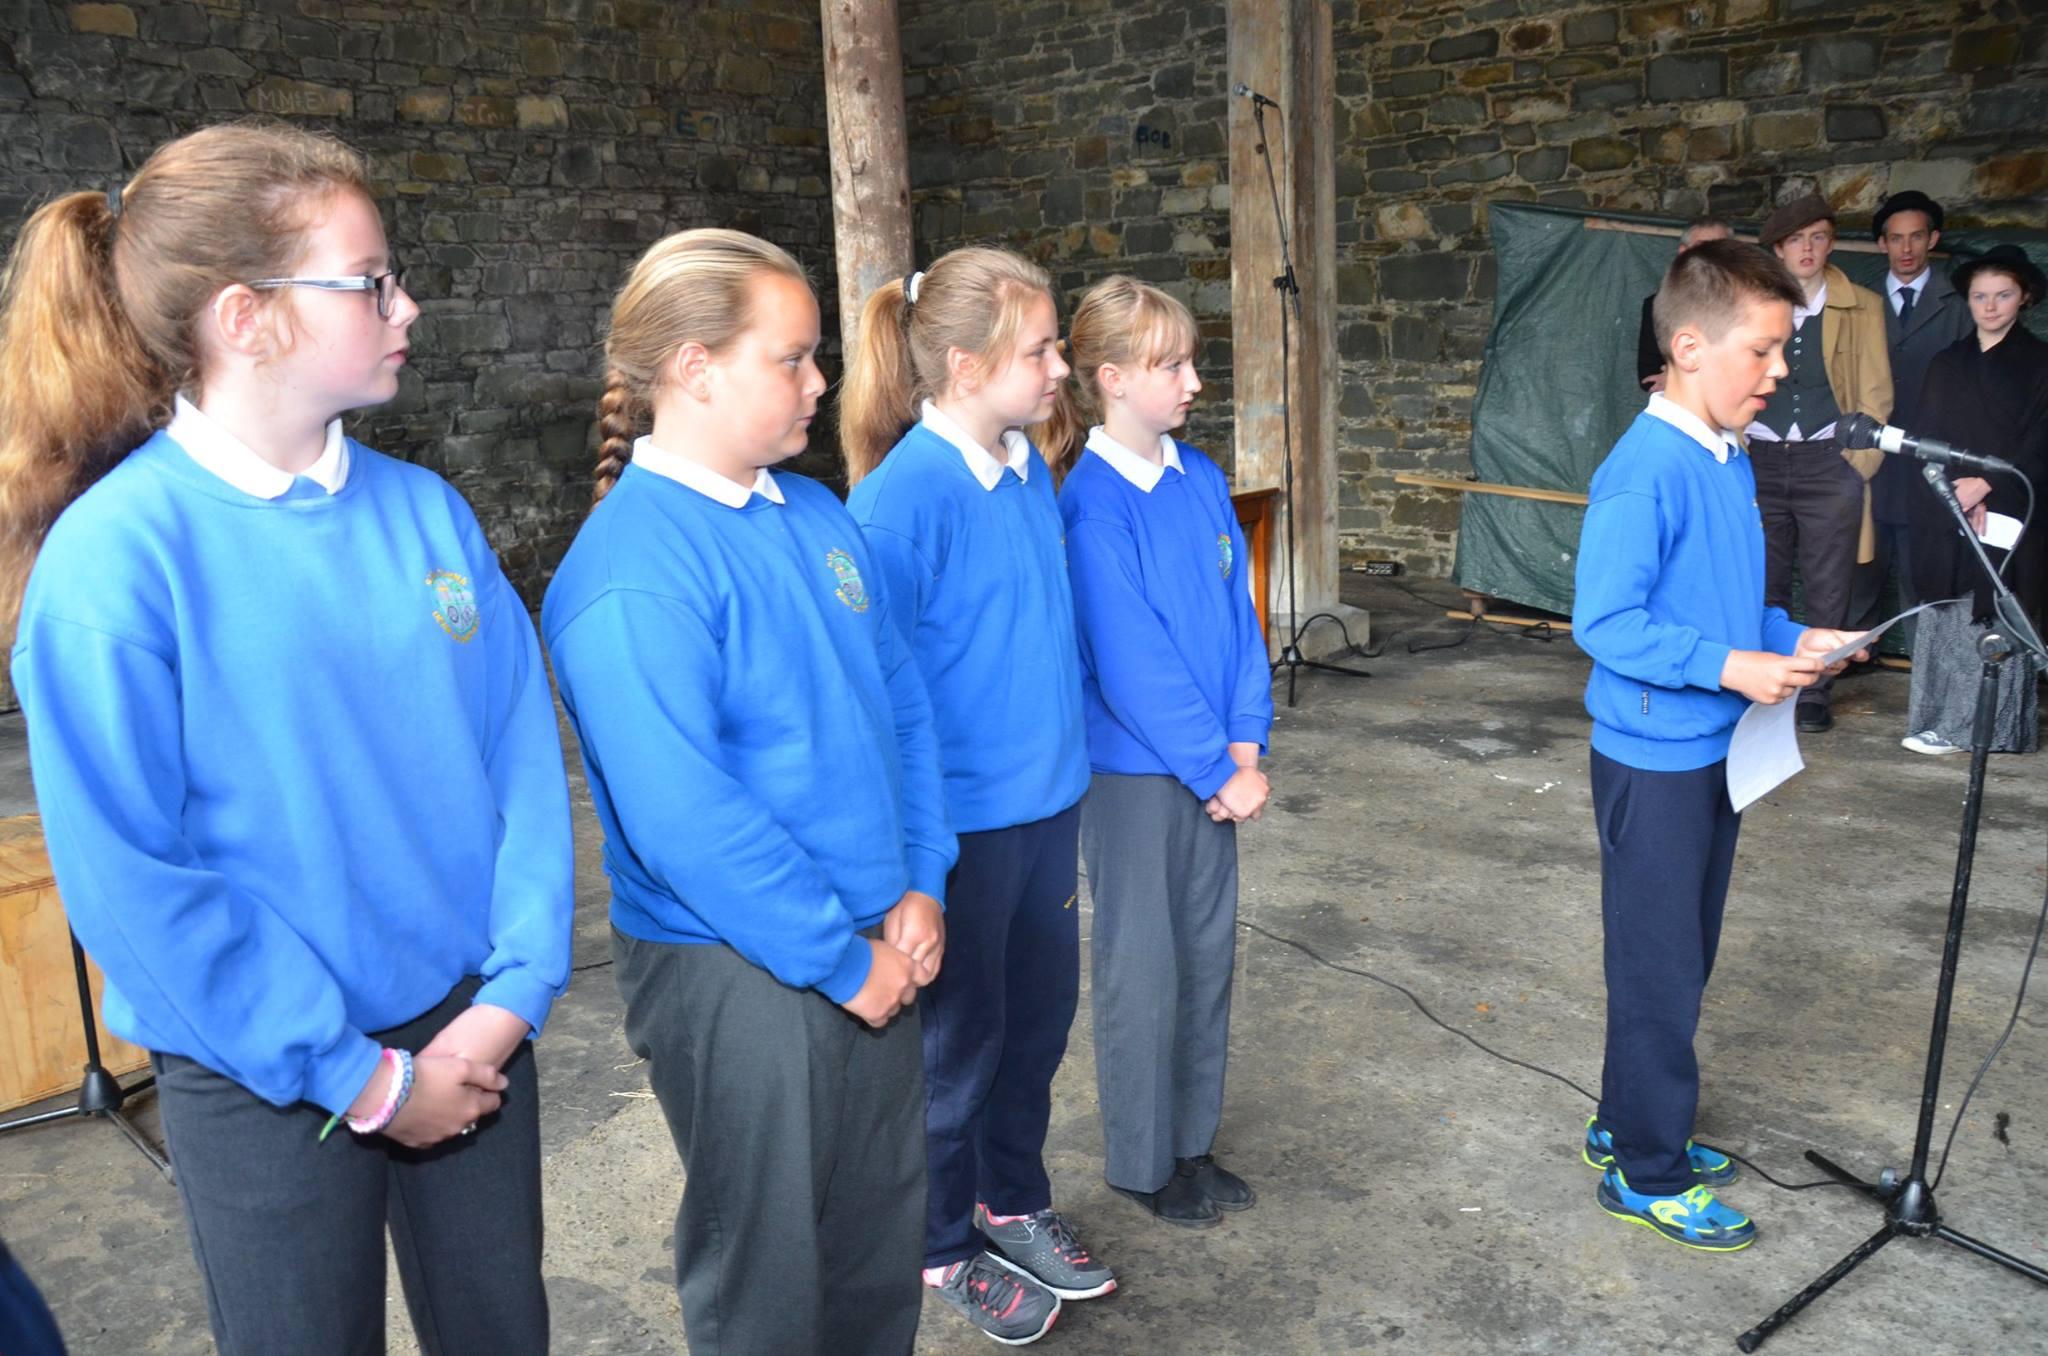 Children from Scoil Eanna read their Proclamation